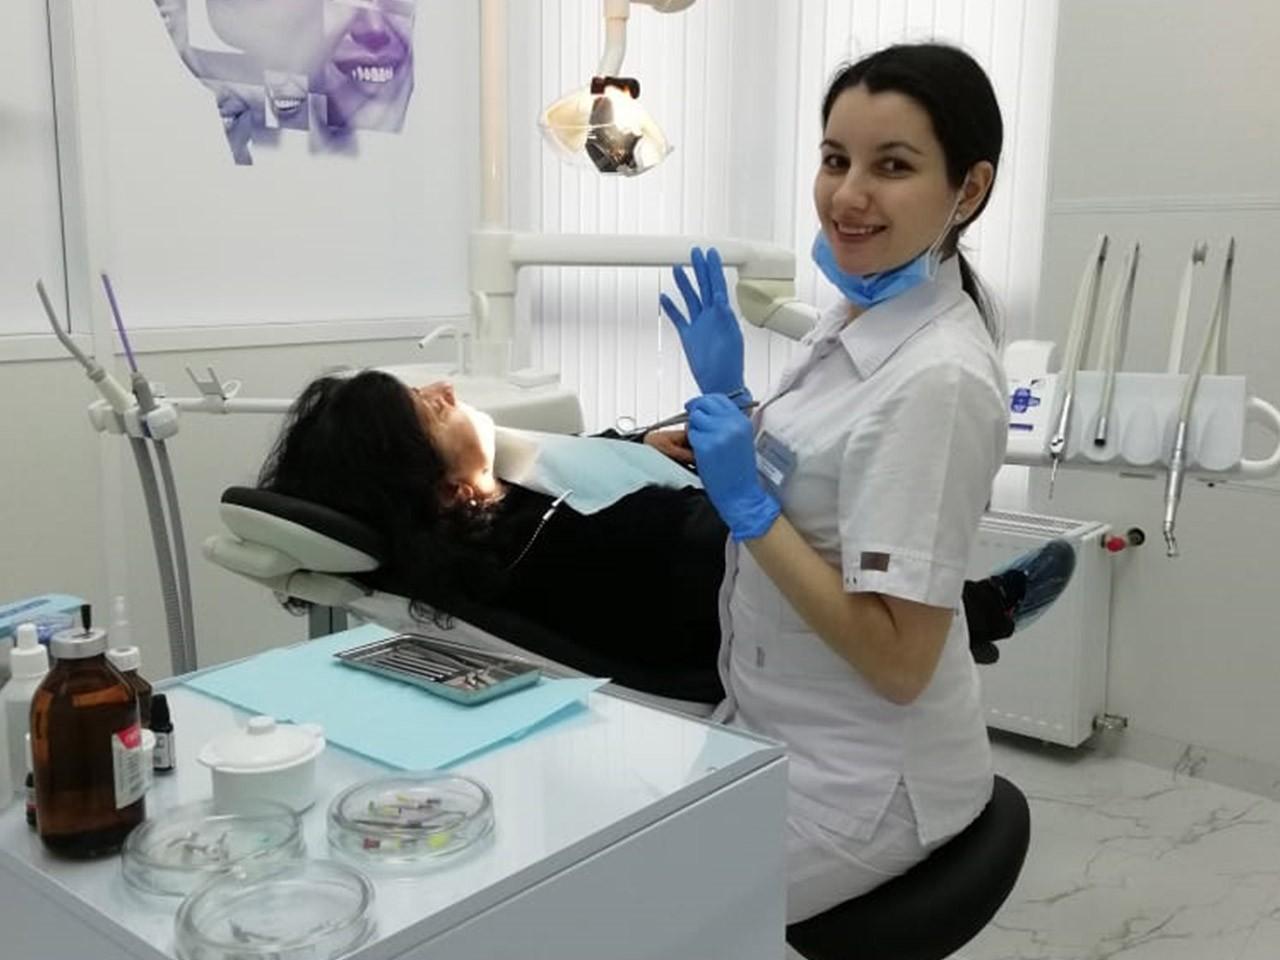 Сакунц Ляна Геворковна. Врач-стоматолог, ортопед